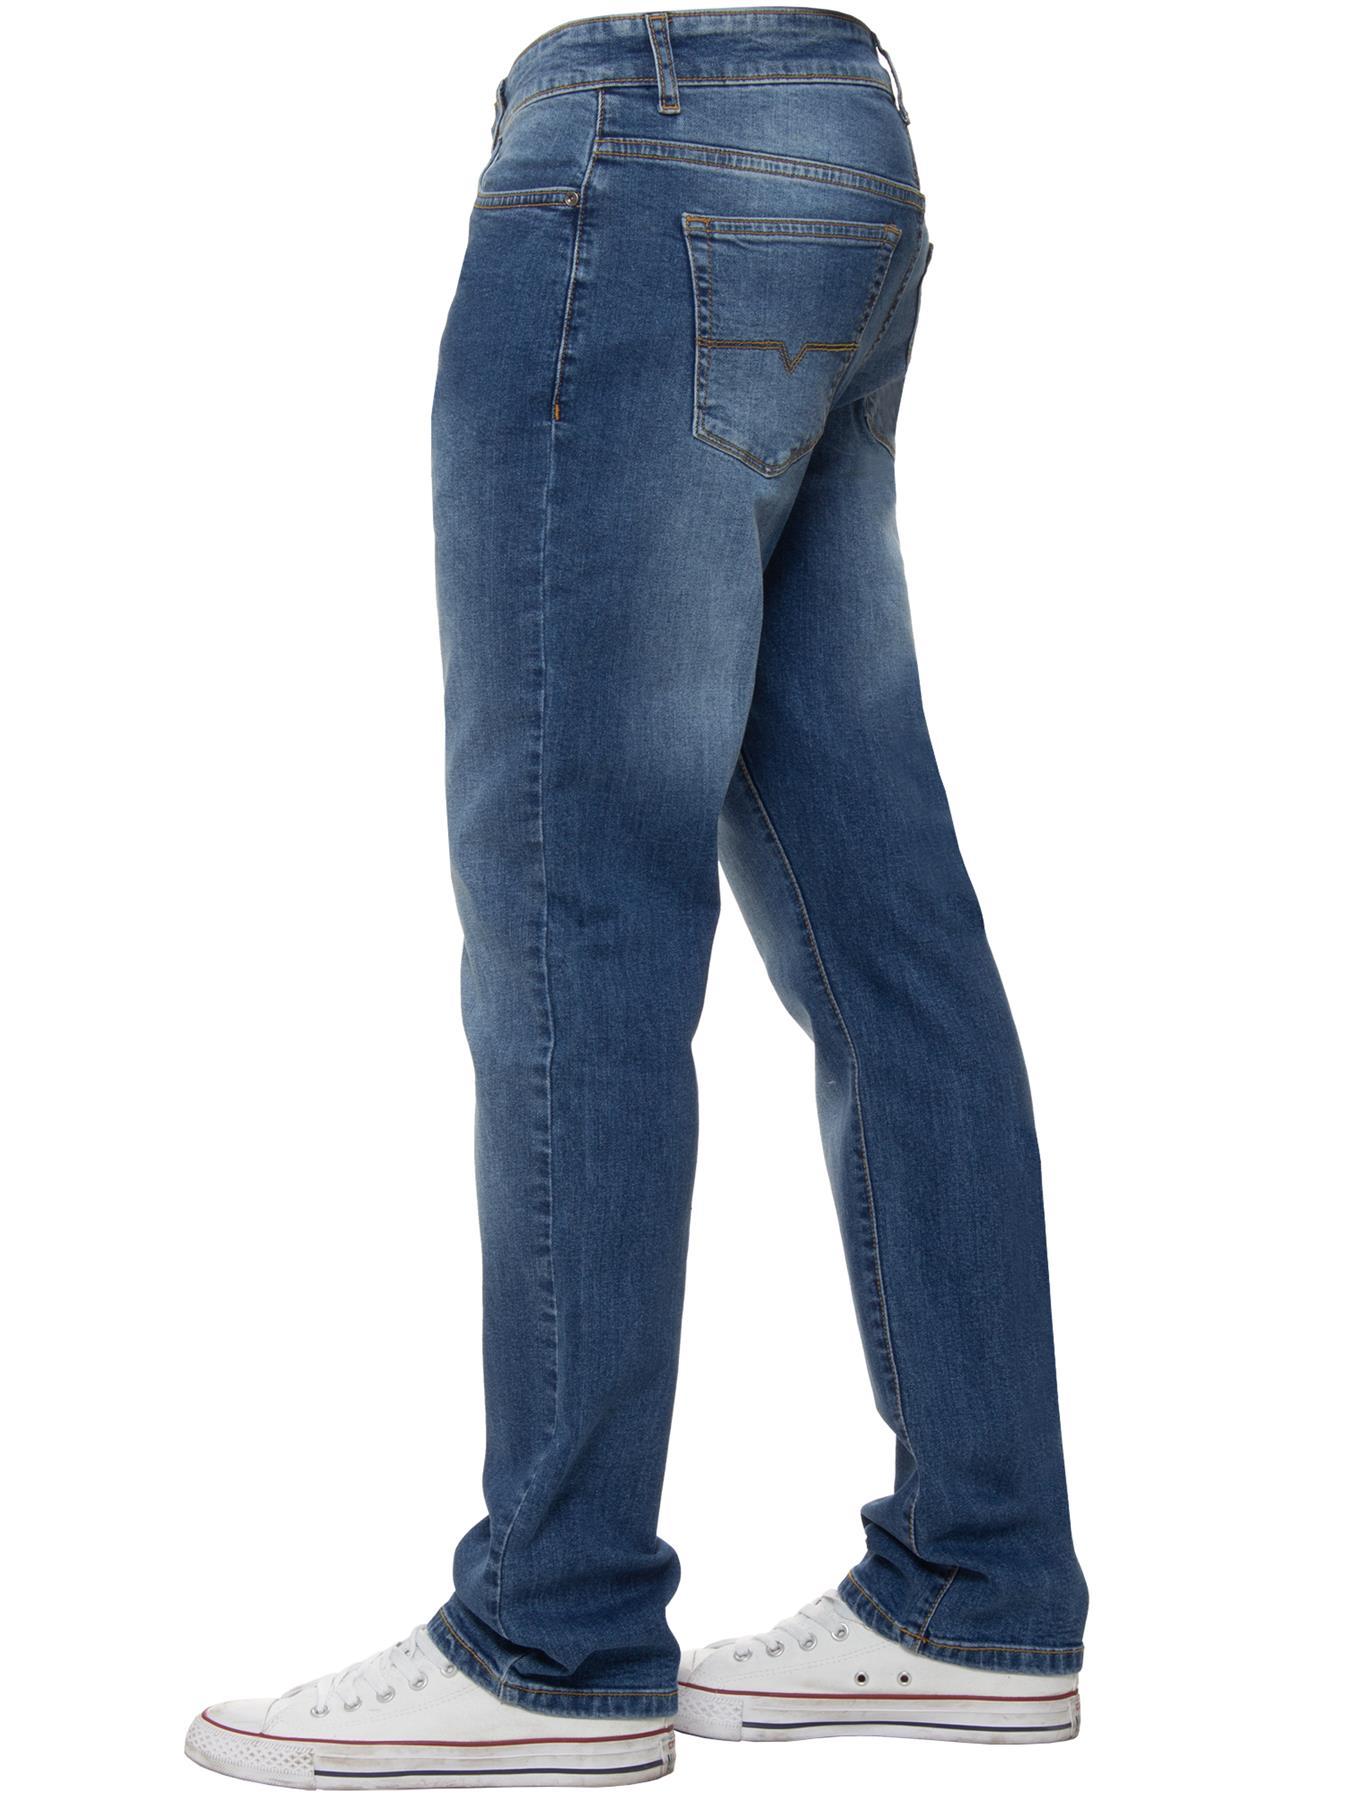 Para-Hombre-Pierna-Recta-Bootcut-Stretch-Denim-Regulares-Pantalon-de-trabajo-Kruze-Todas-Cinturas miniatura 11